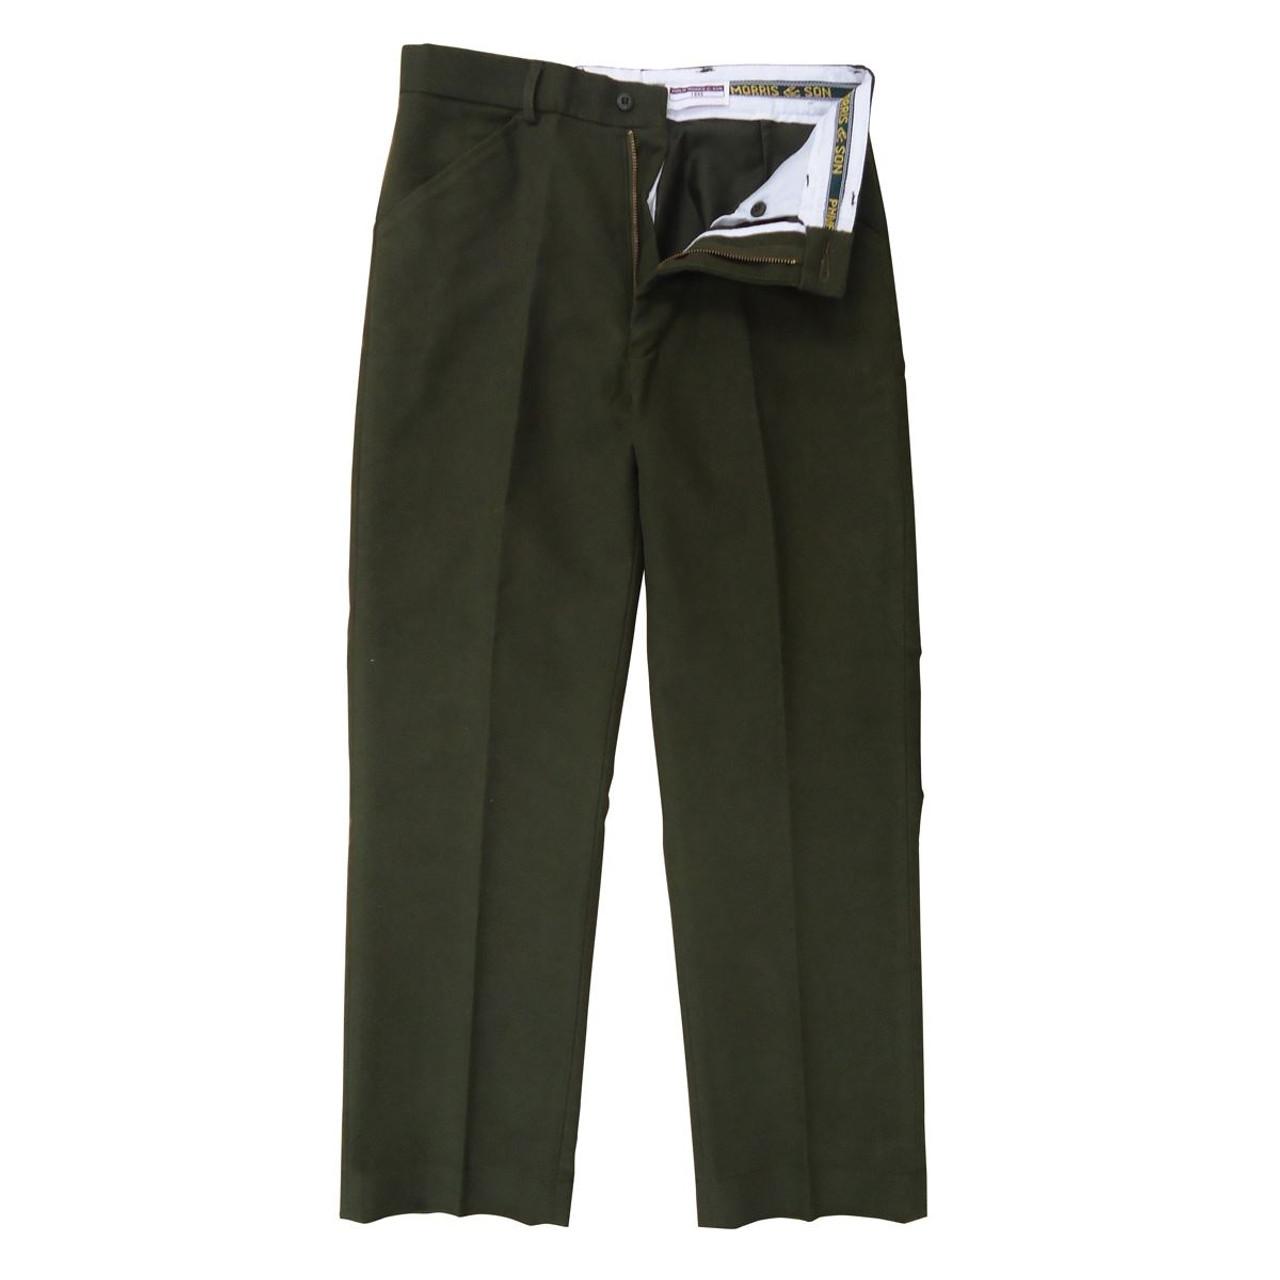 Heritage 1845 Moleskin Trousers